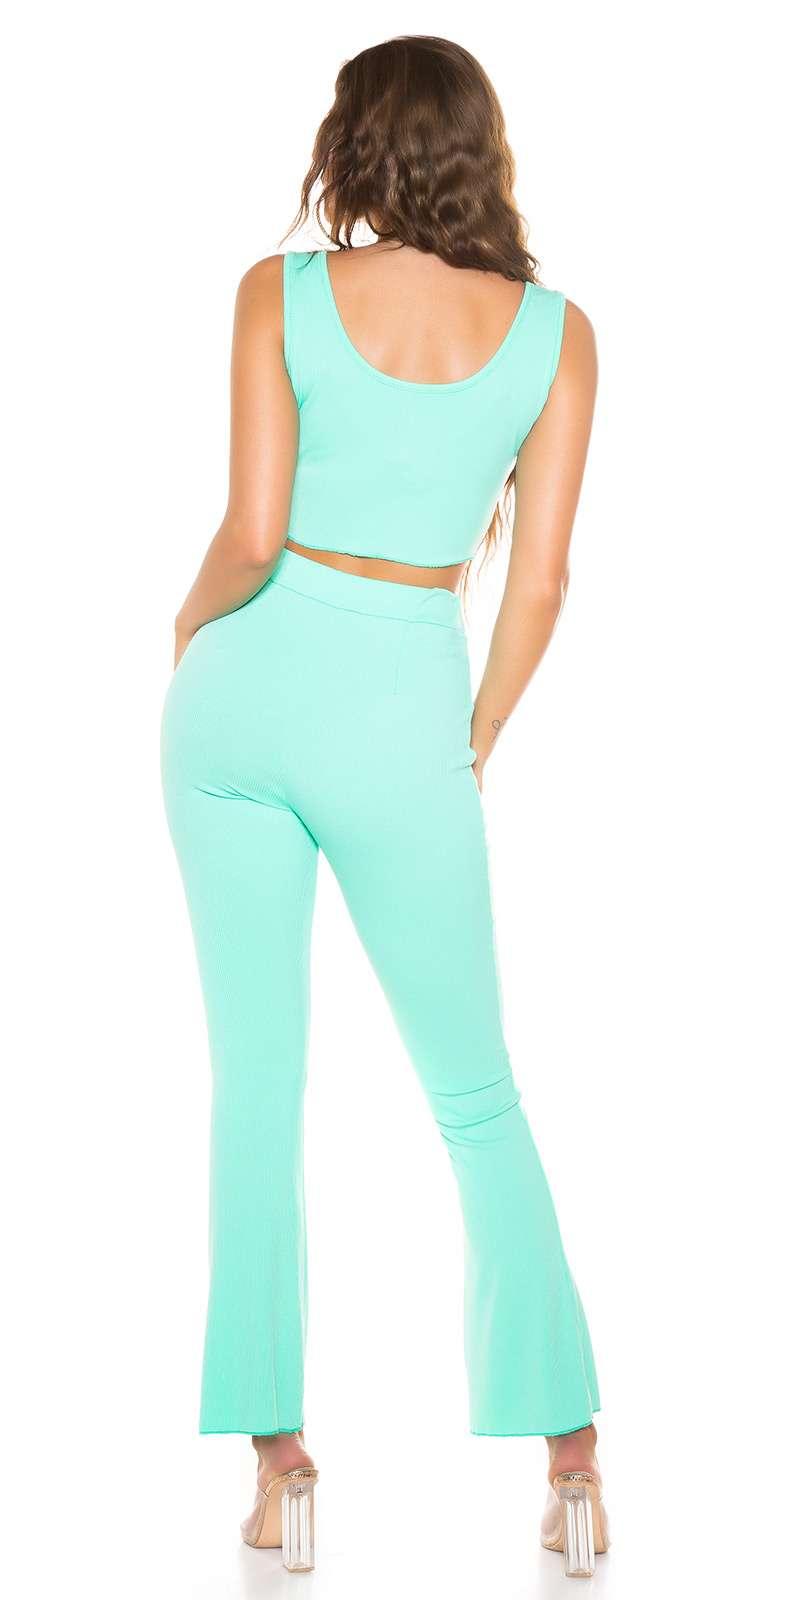 Pantalon & Top Ilma